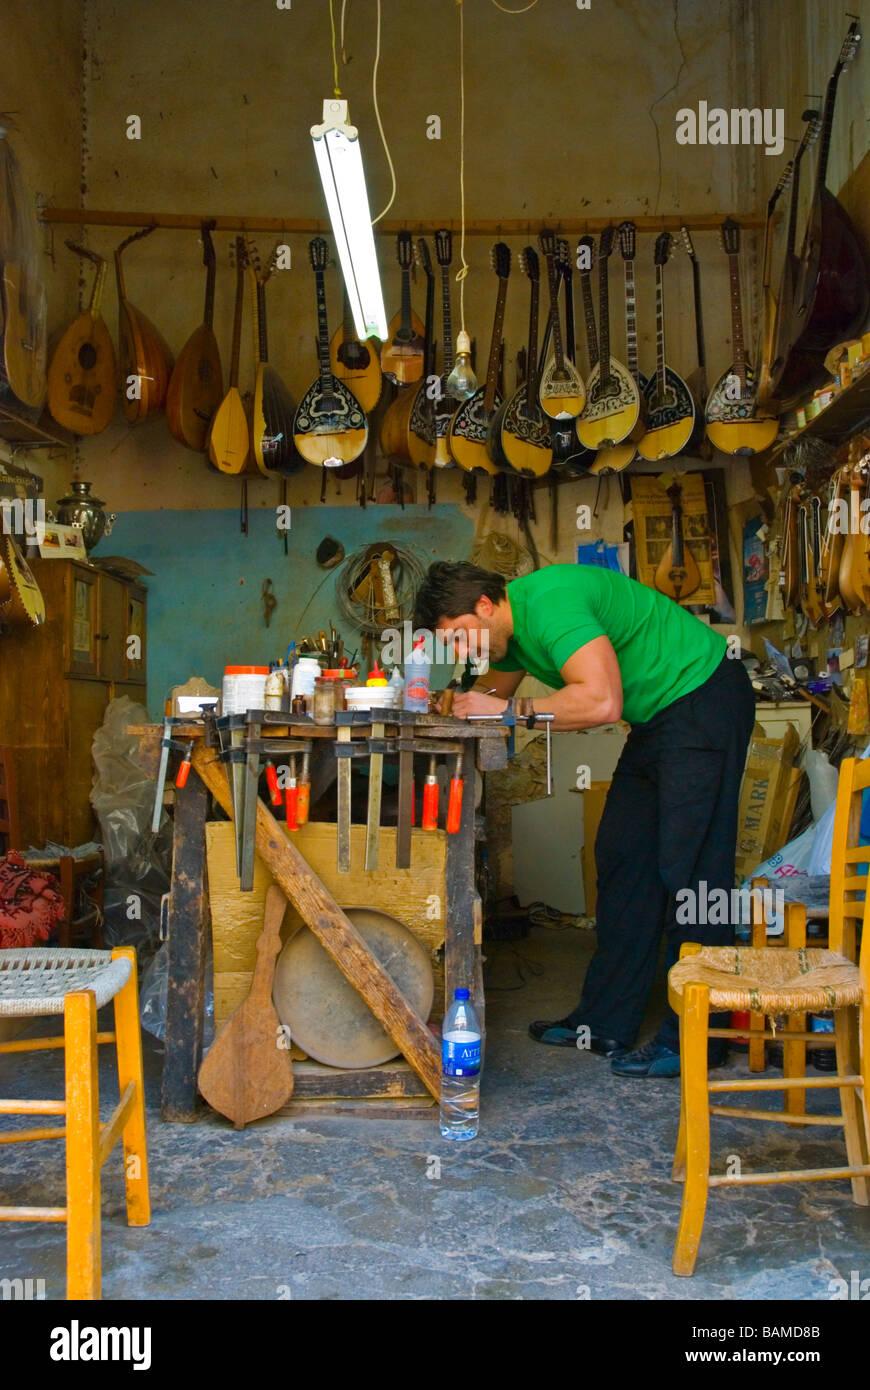 Guitar Repair Shop In Old Town Rethymno Crete Greece Europe Stock